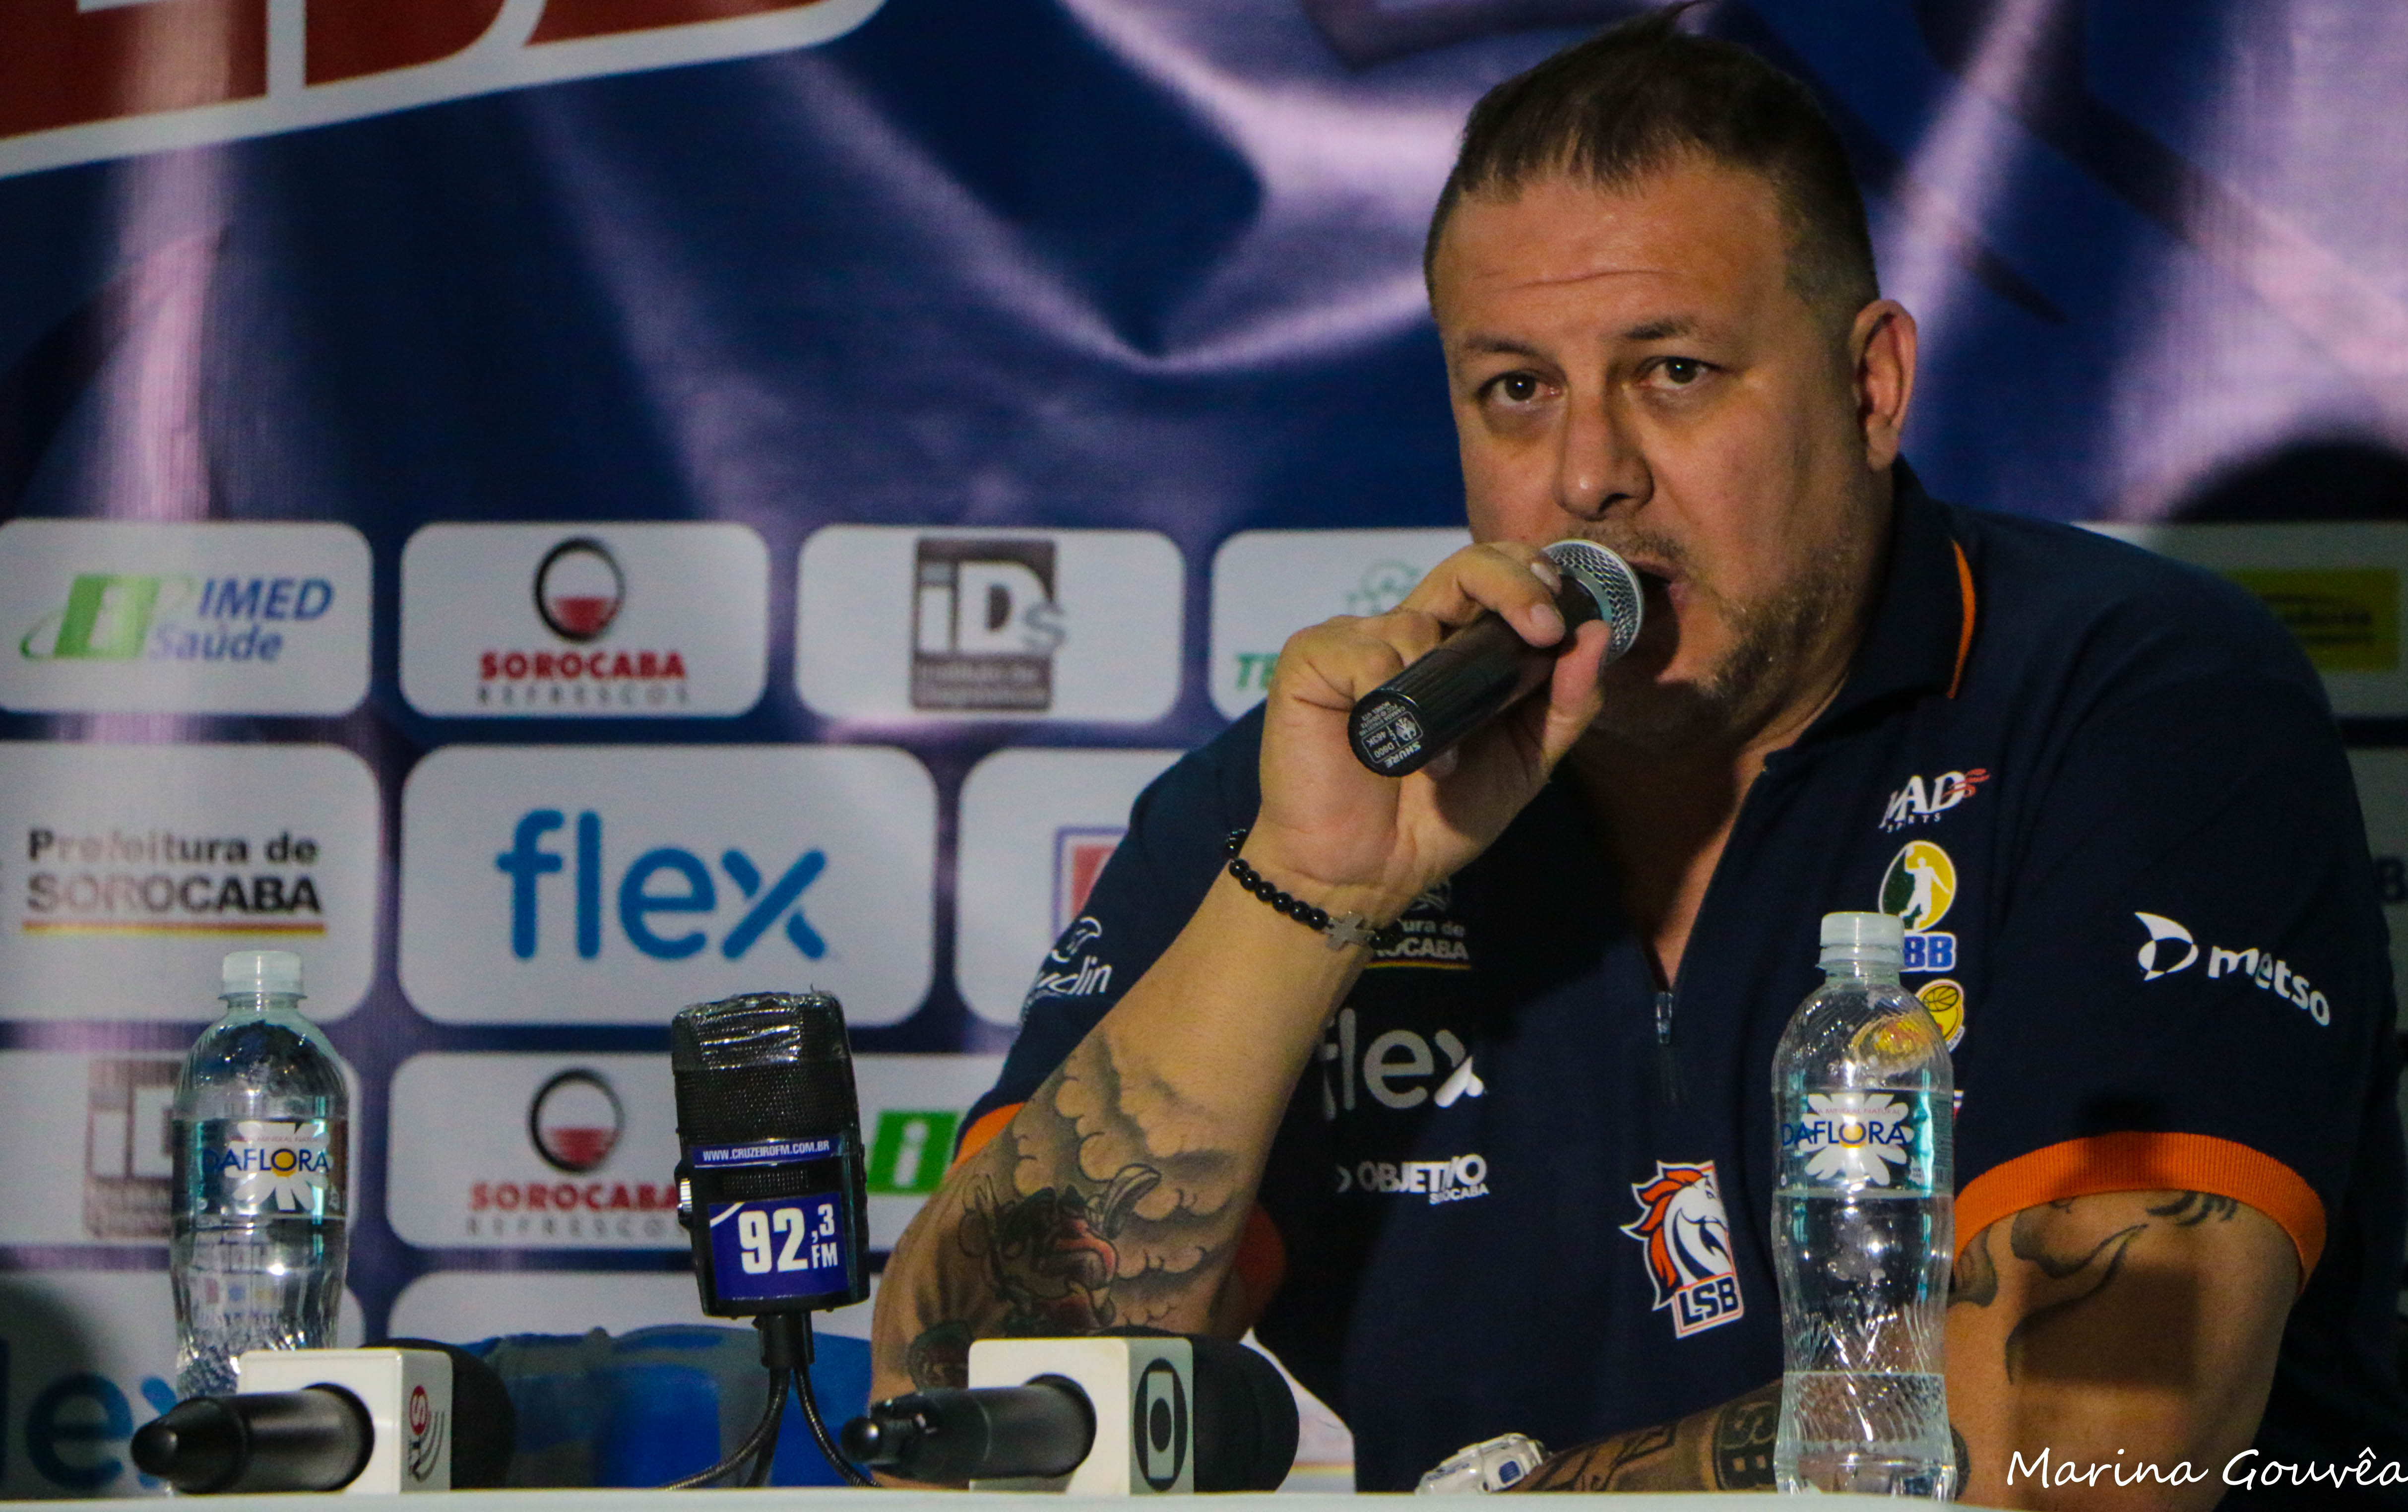 Rinaldo Rodrigues